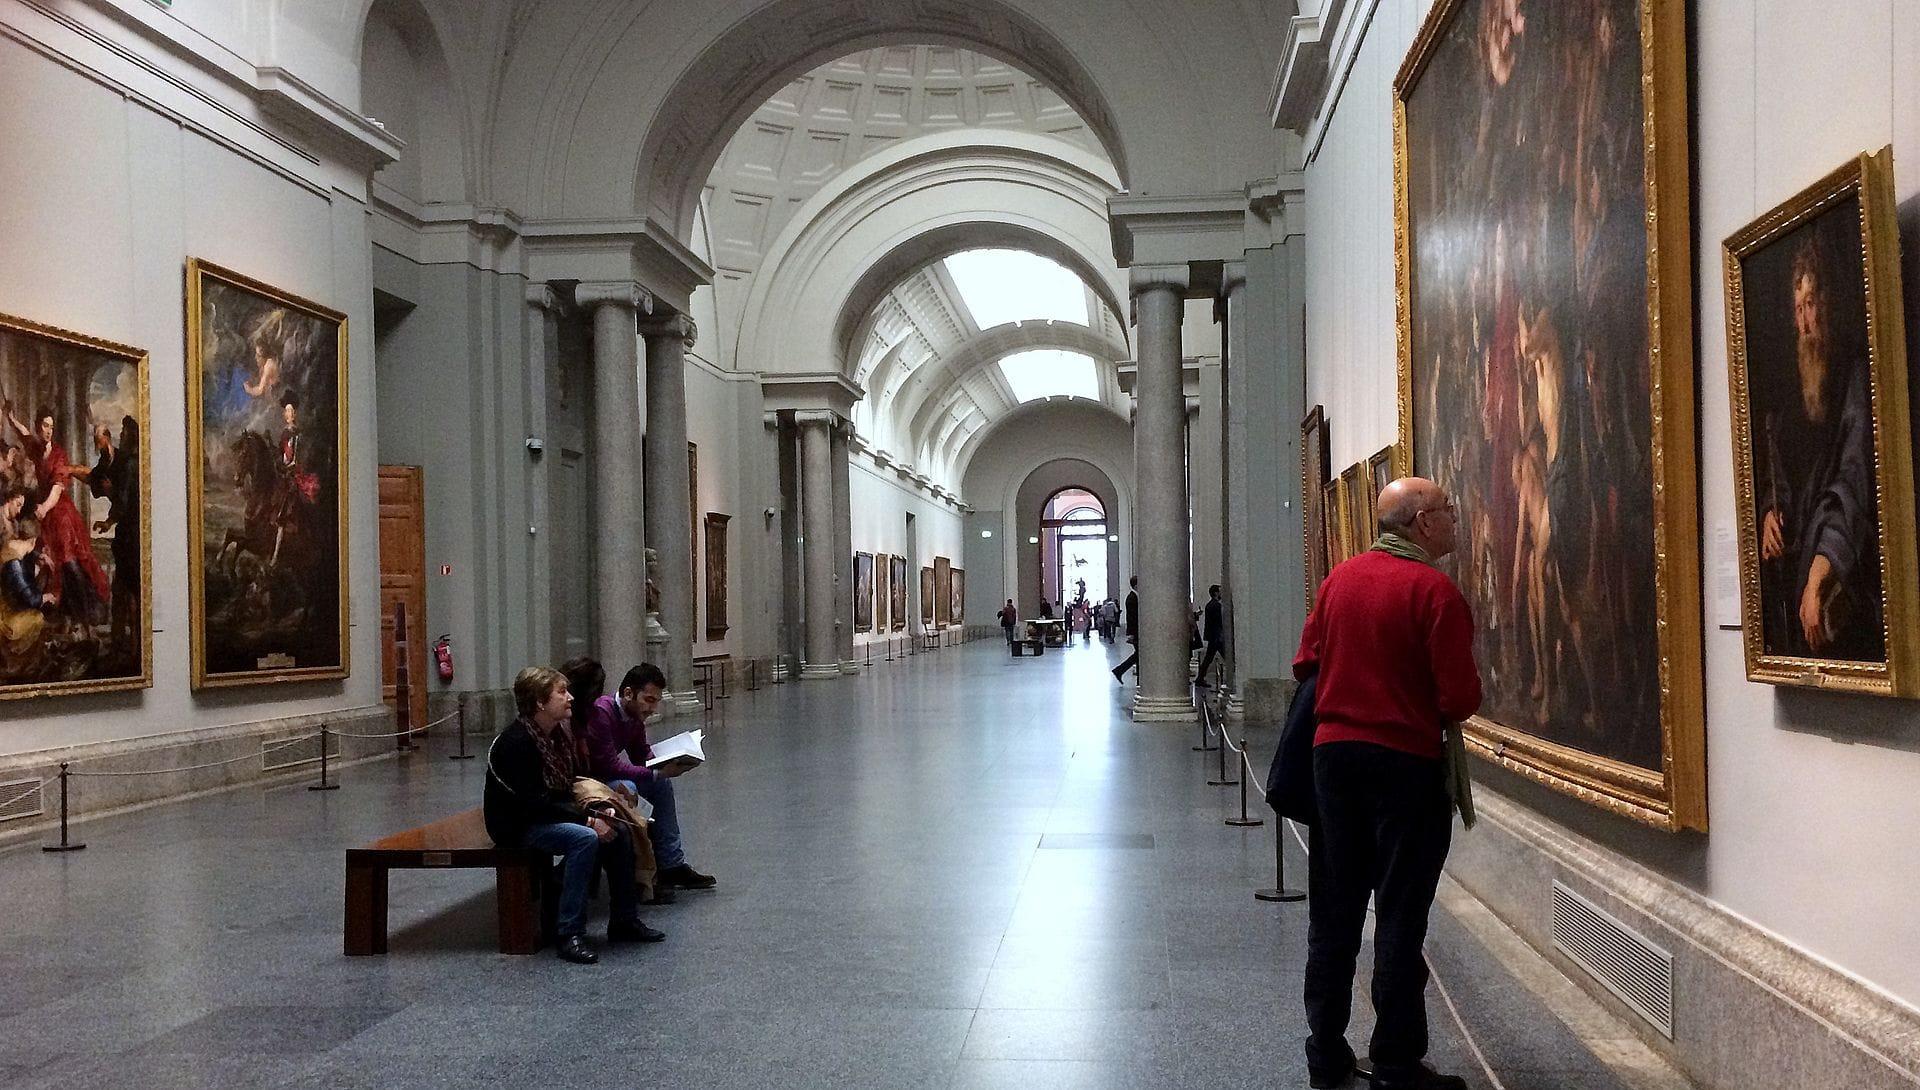 Grand_hall_d'exposition_au_Musée_du_Prado.JPG